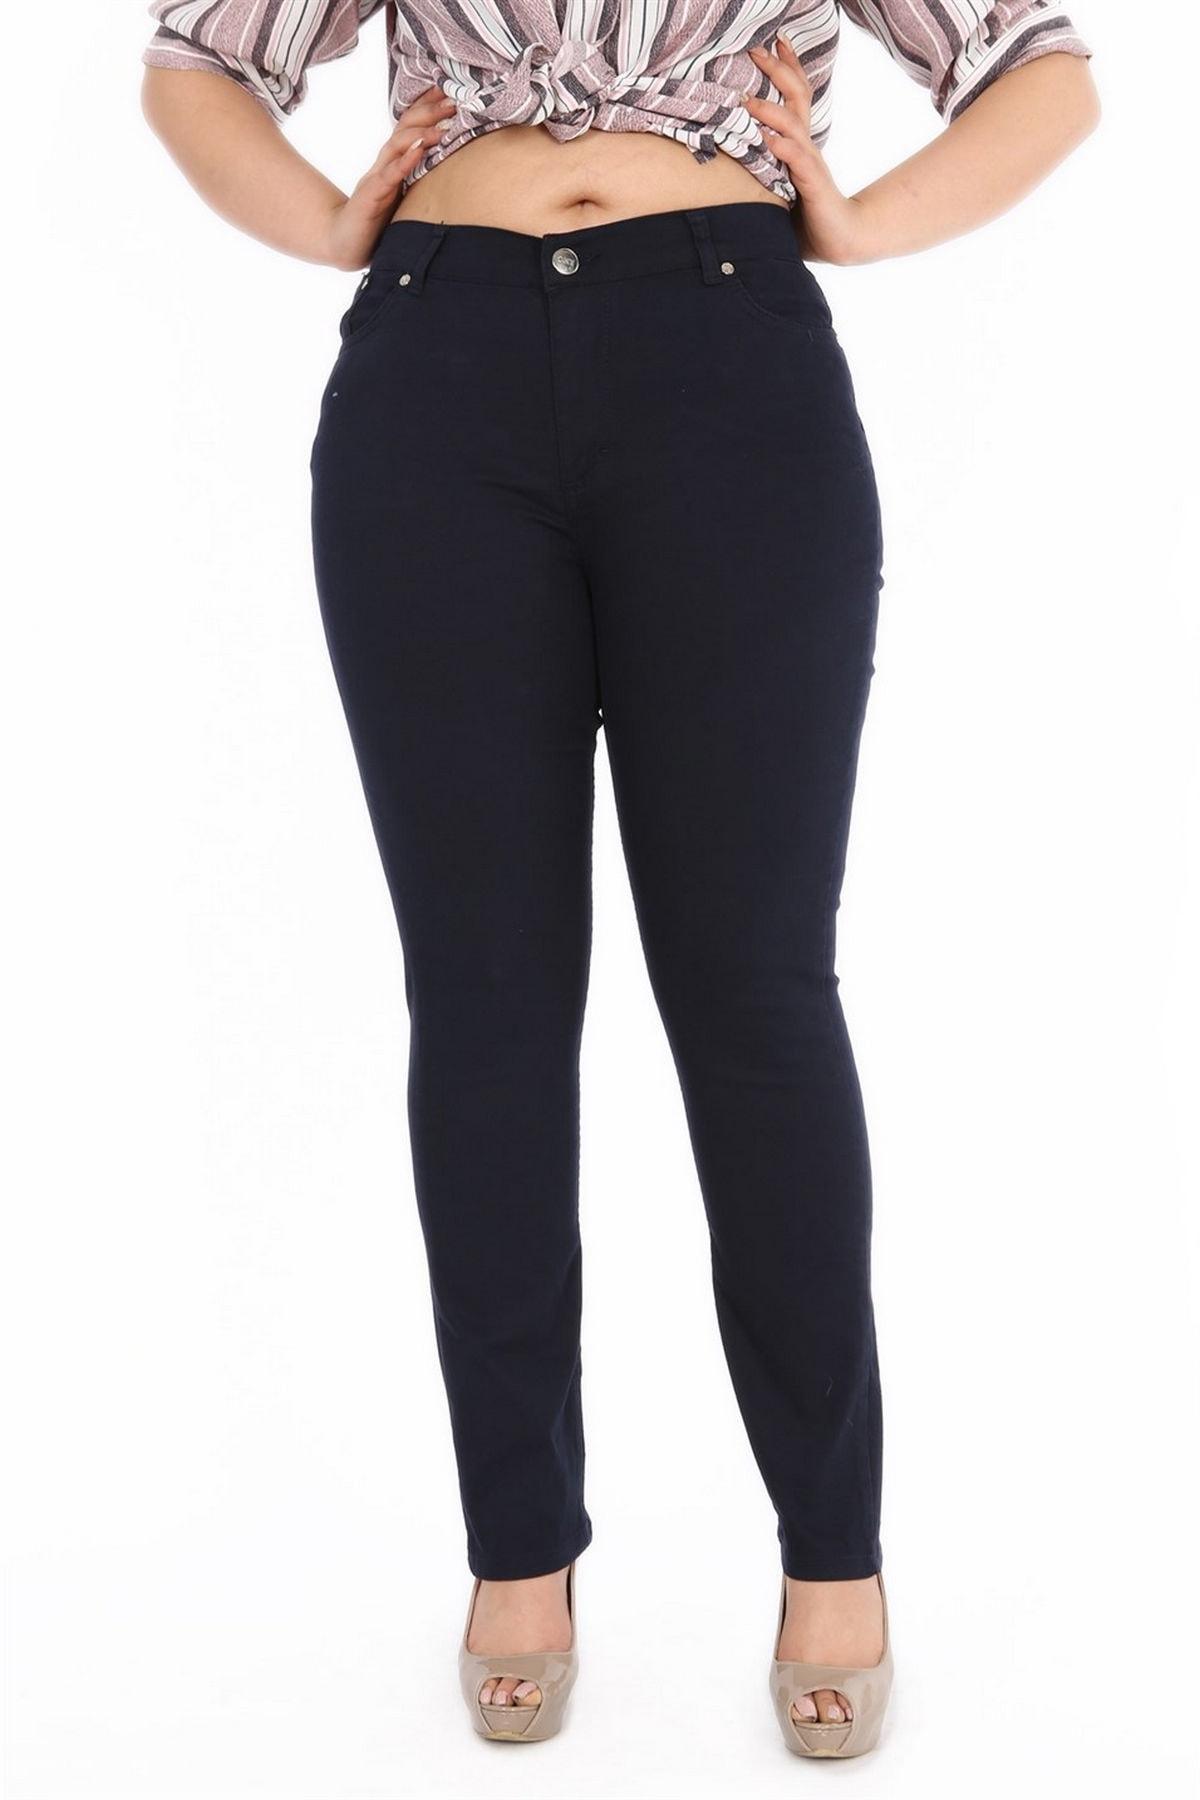 RMG Kadın Pantolon Rg1029kb Jean Battal Yüksek Bel Düz Paç 1